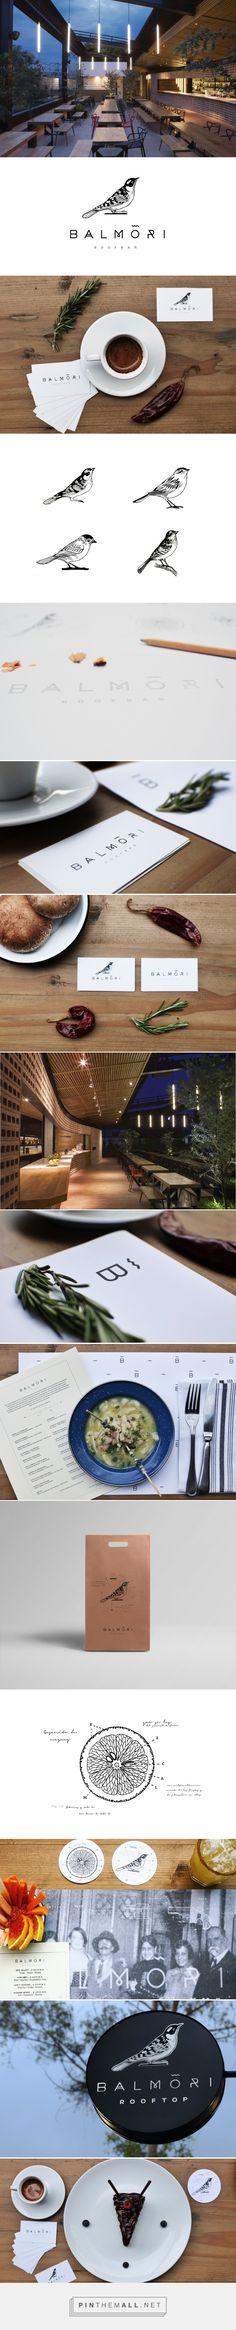 Balmori Roofbar Branding on Behance | Fivestar Branding – Design and Branding Agency & Inspiration Gallery